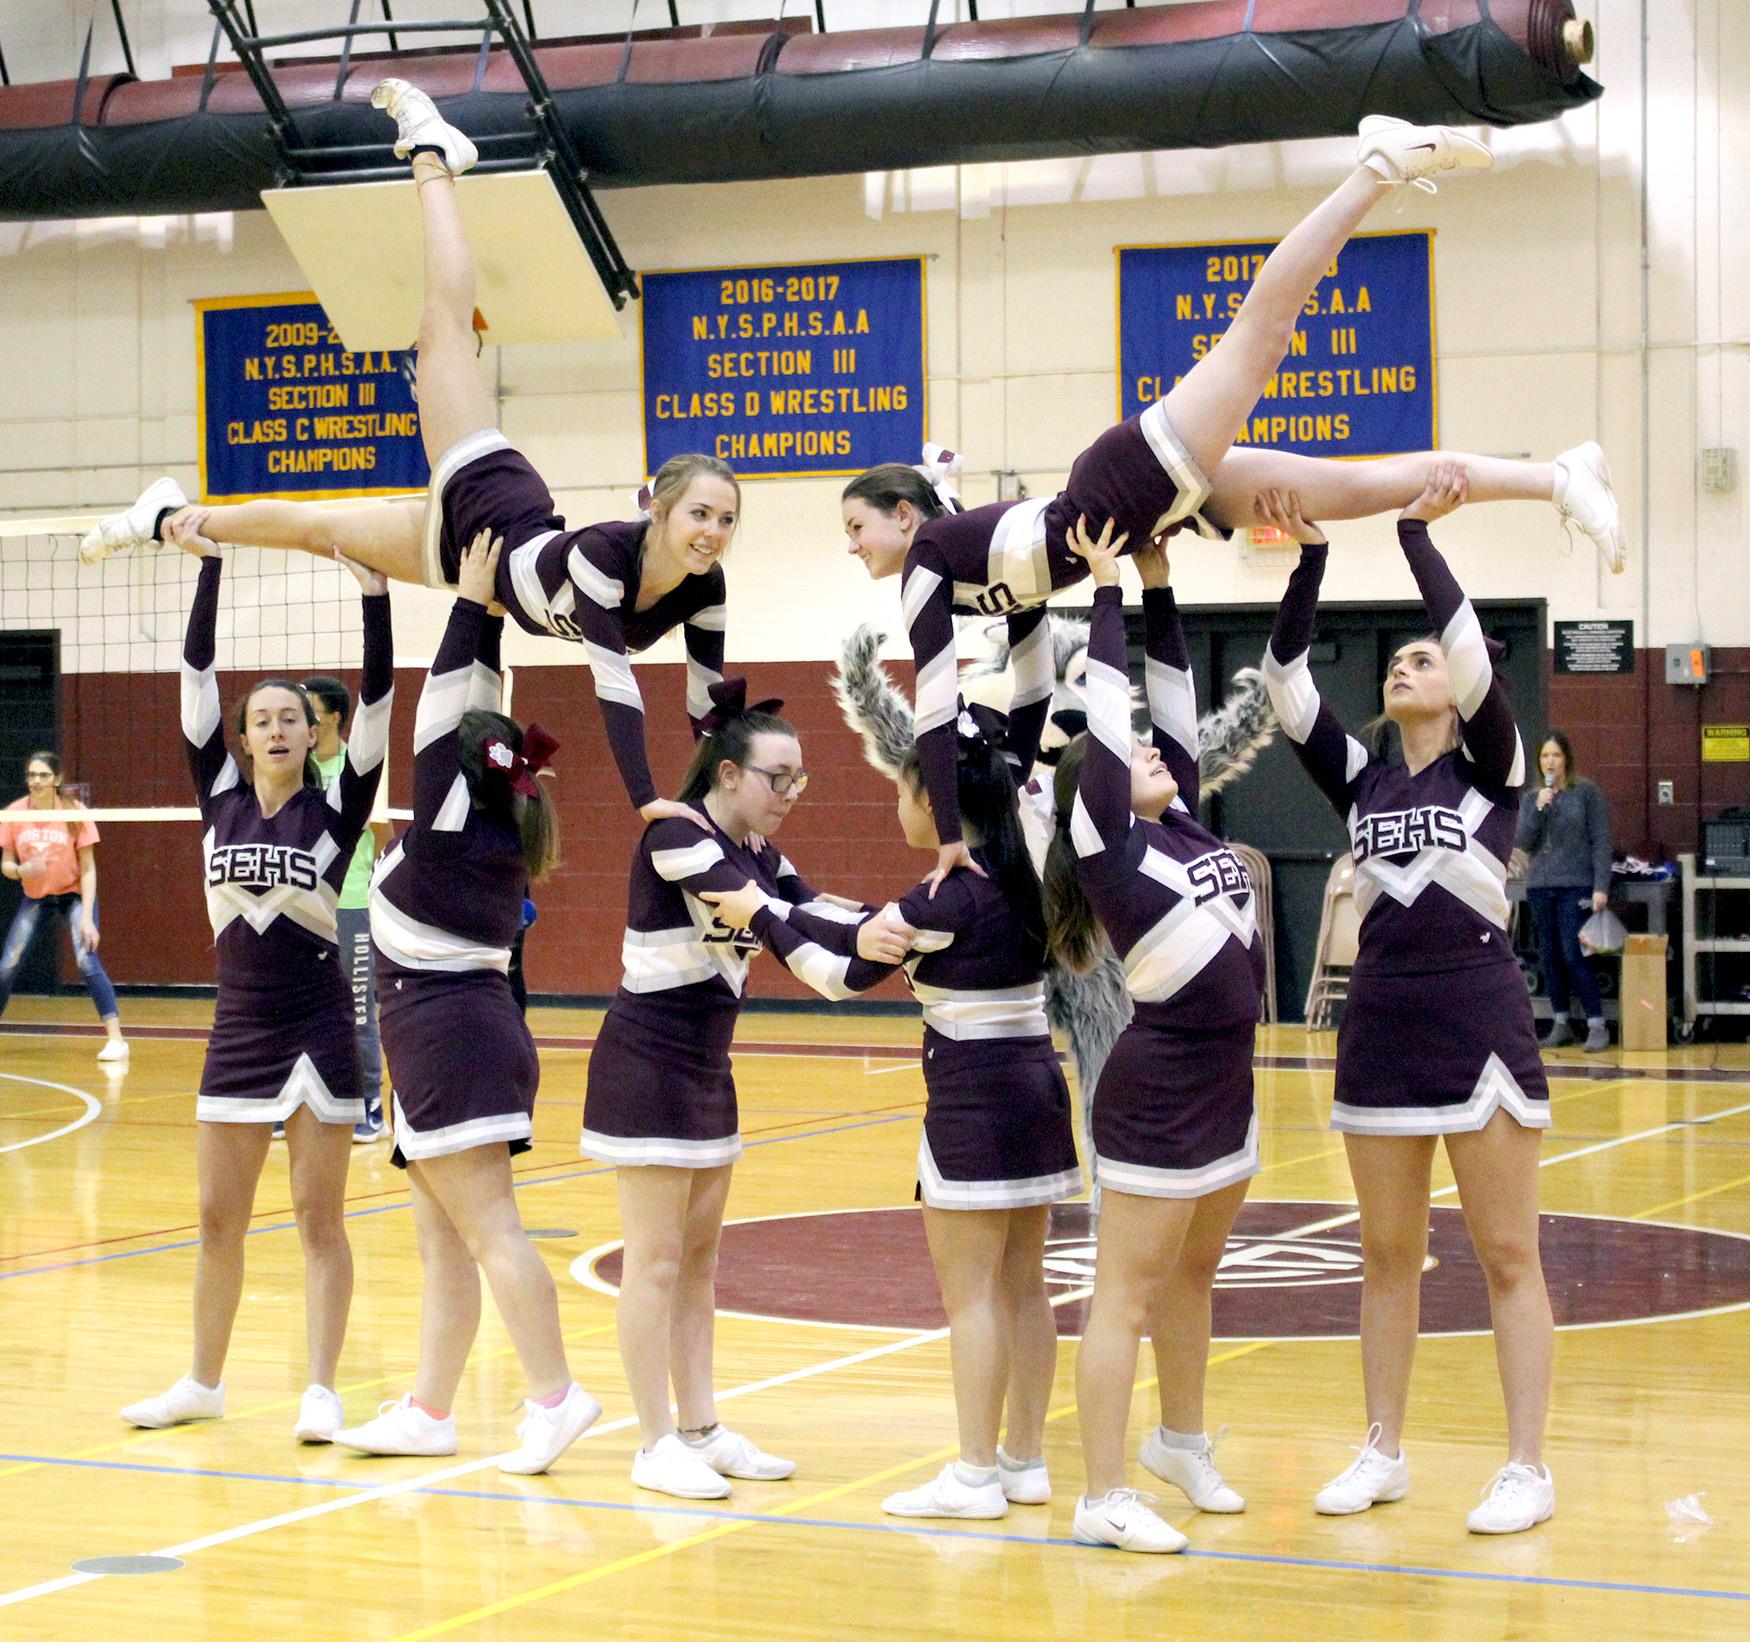 Cheerleaders in formation (2/2021)